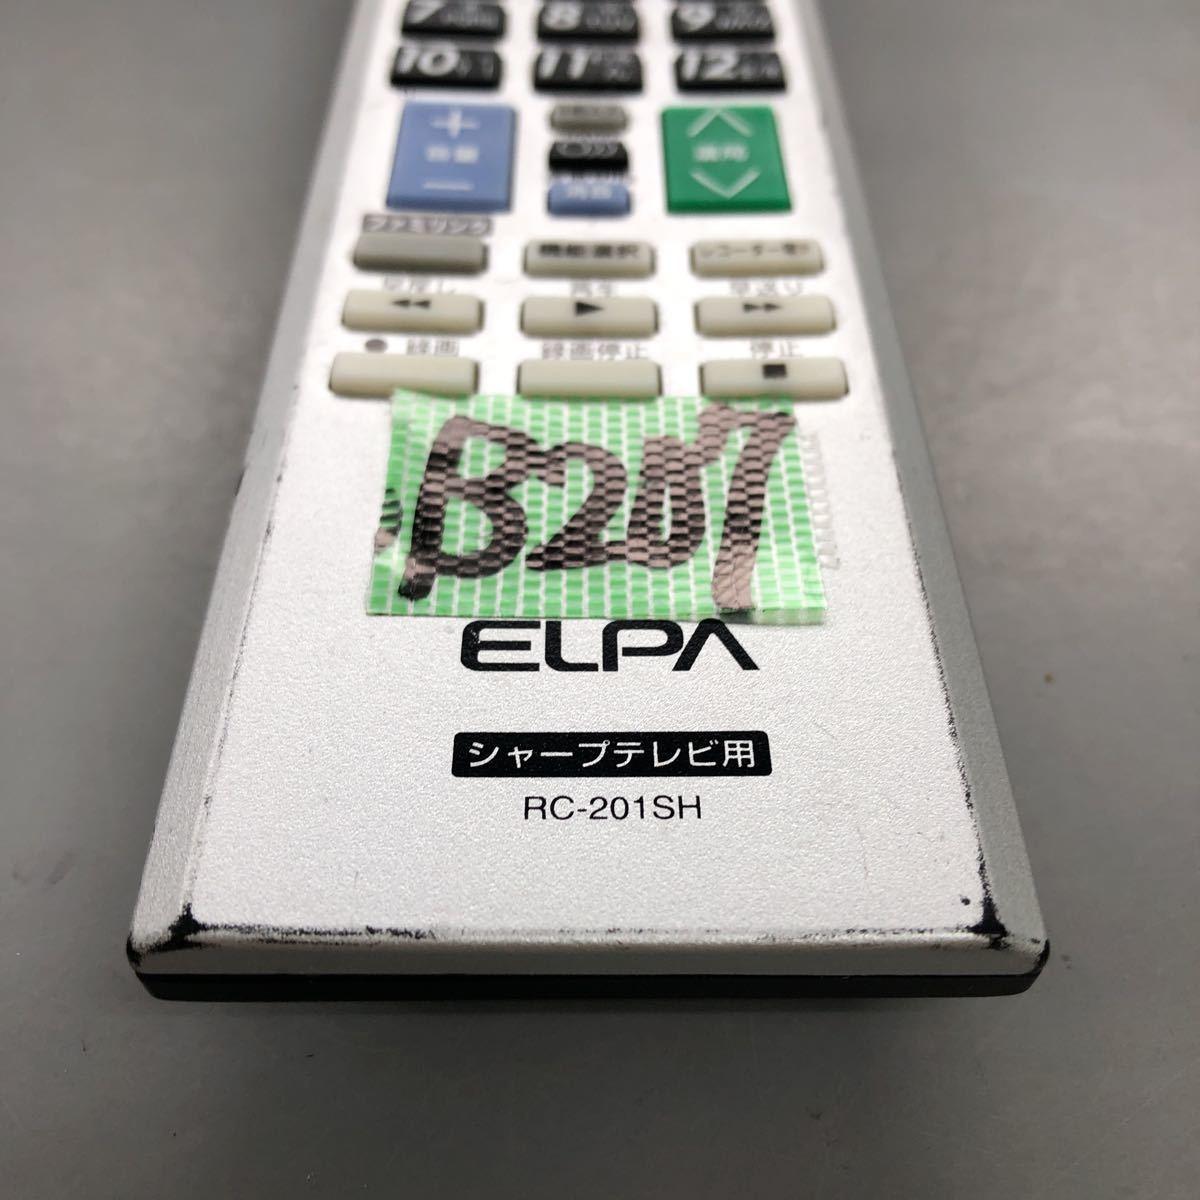 (B207)送料無料 ELPA シャープテレビ用 リモコン RC-201SH_画像2